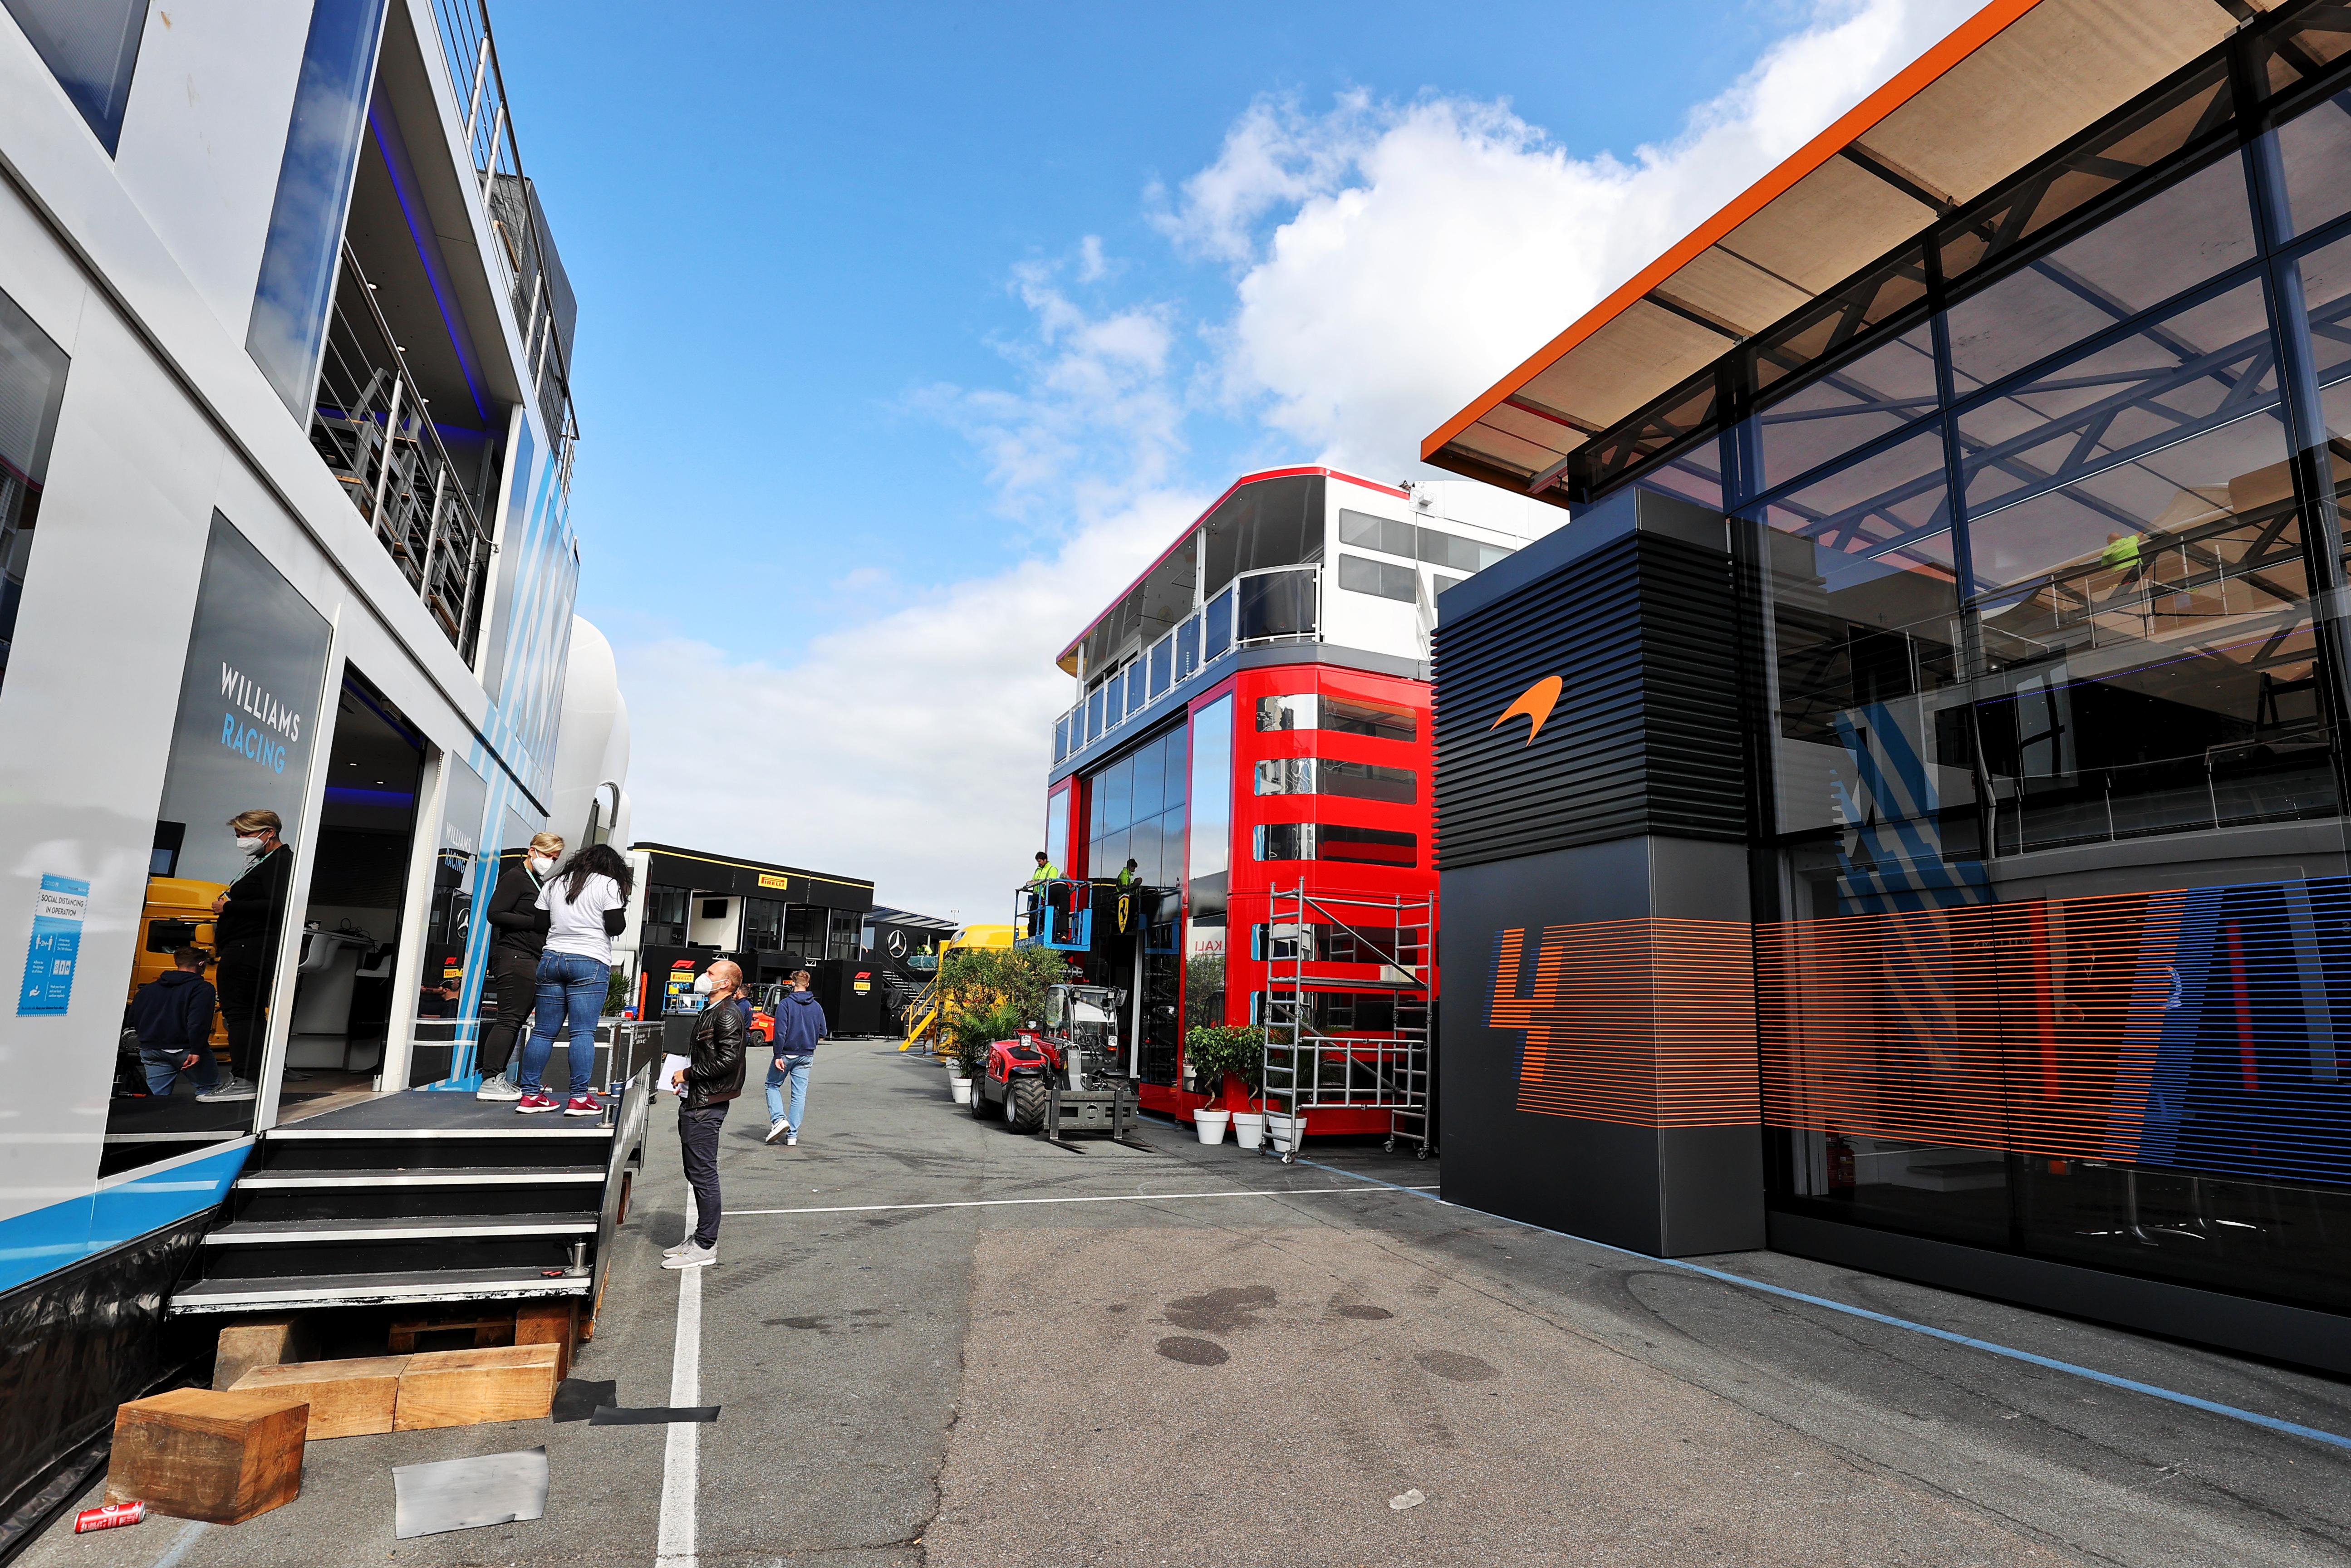 Motor Racing Formula One World Championship Dutch Grand Prix Preparation Day Zandvoort, Netherlands